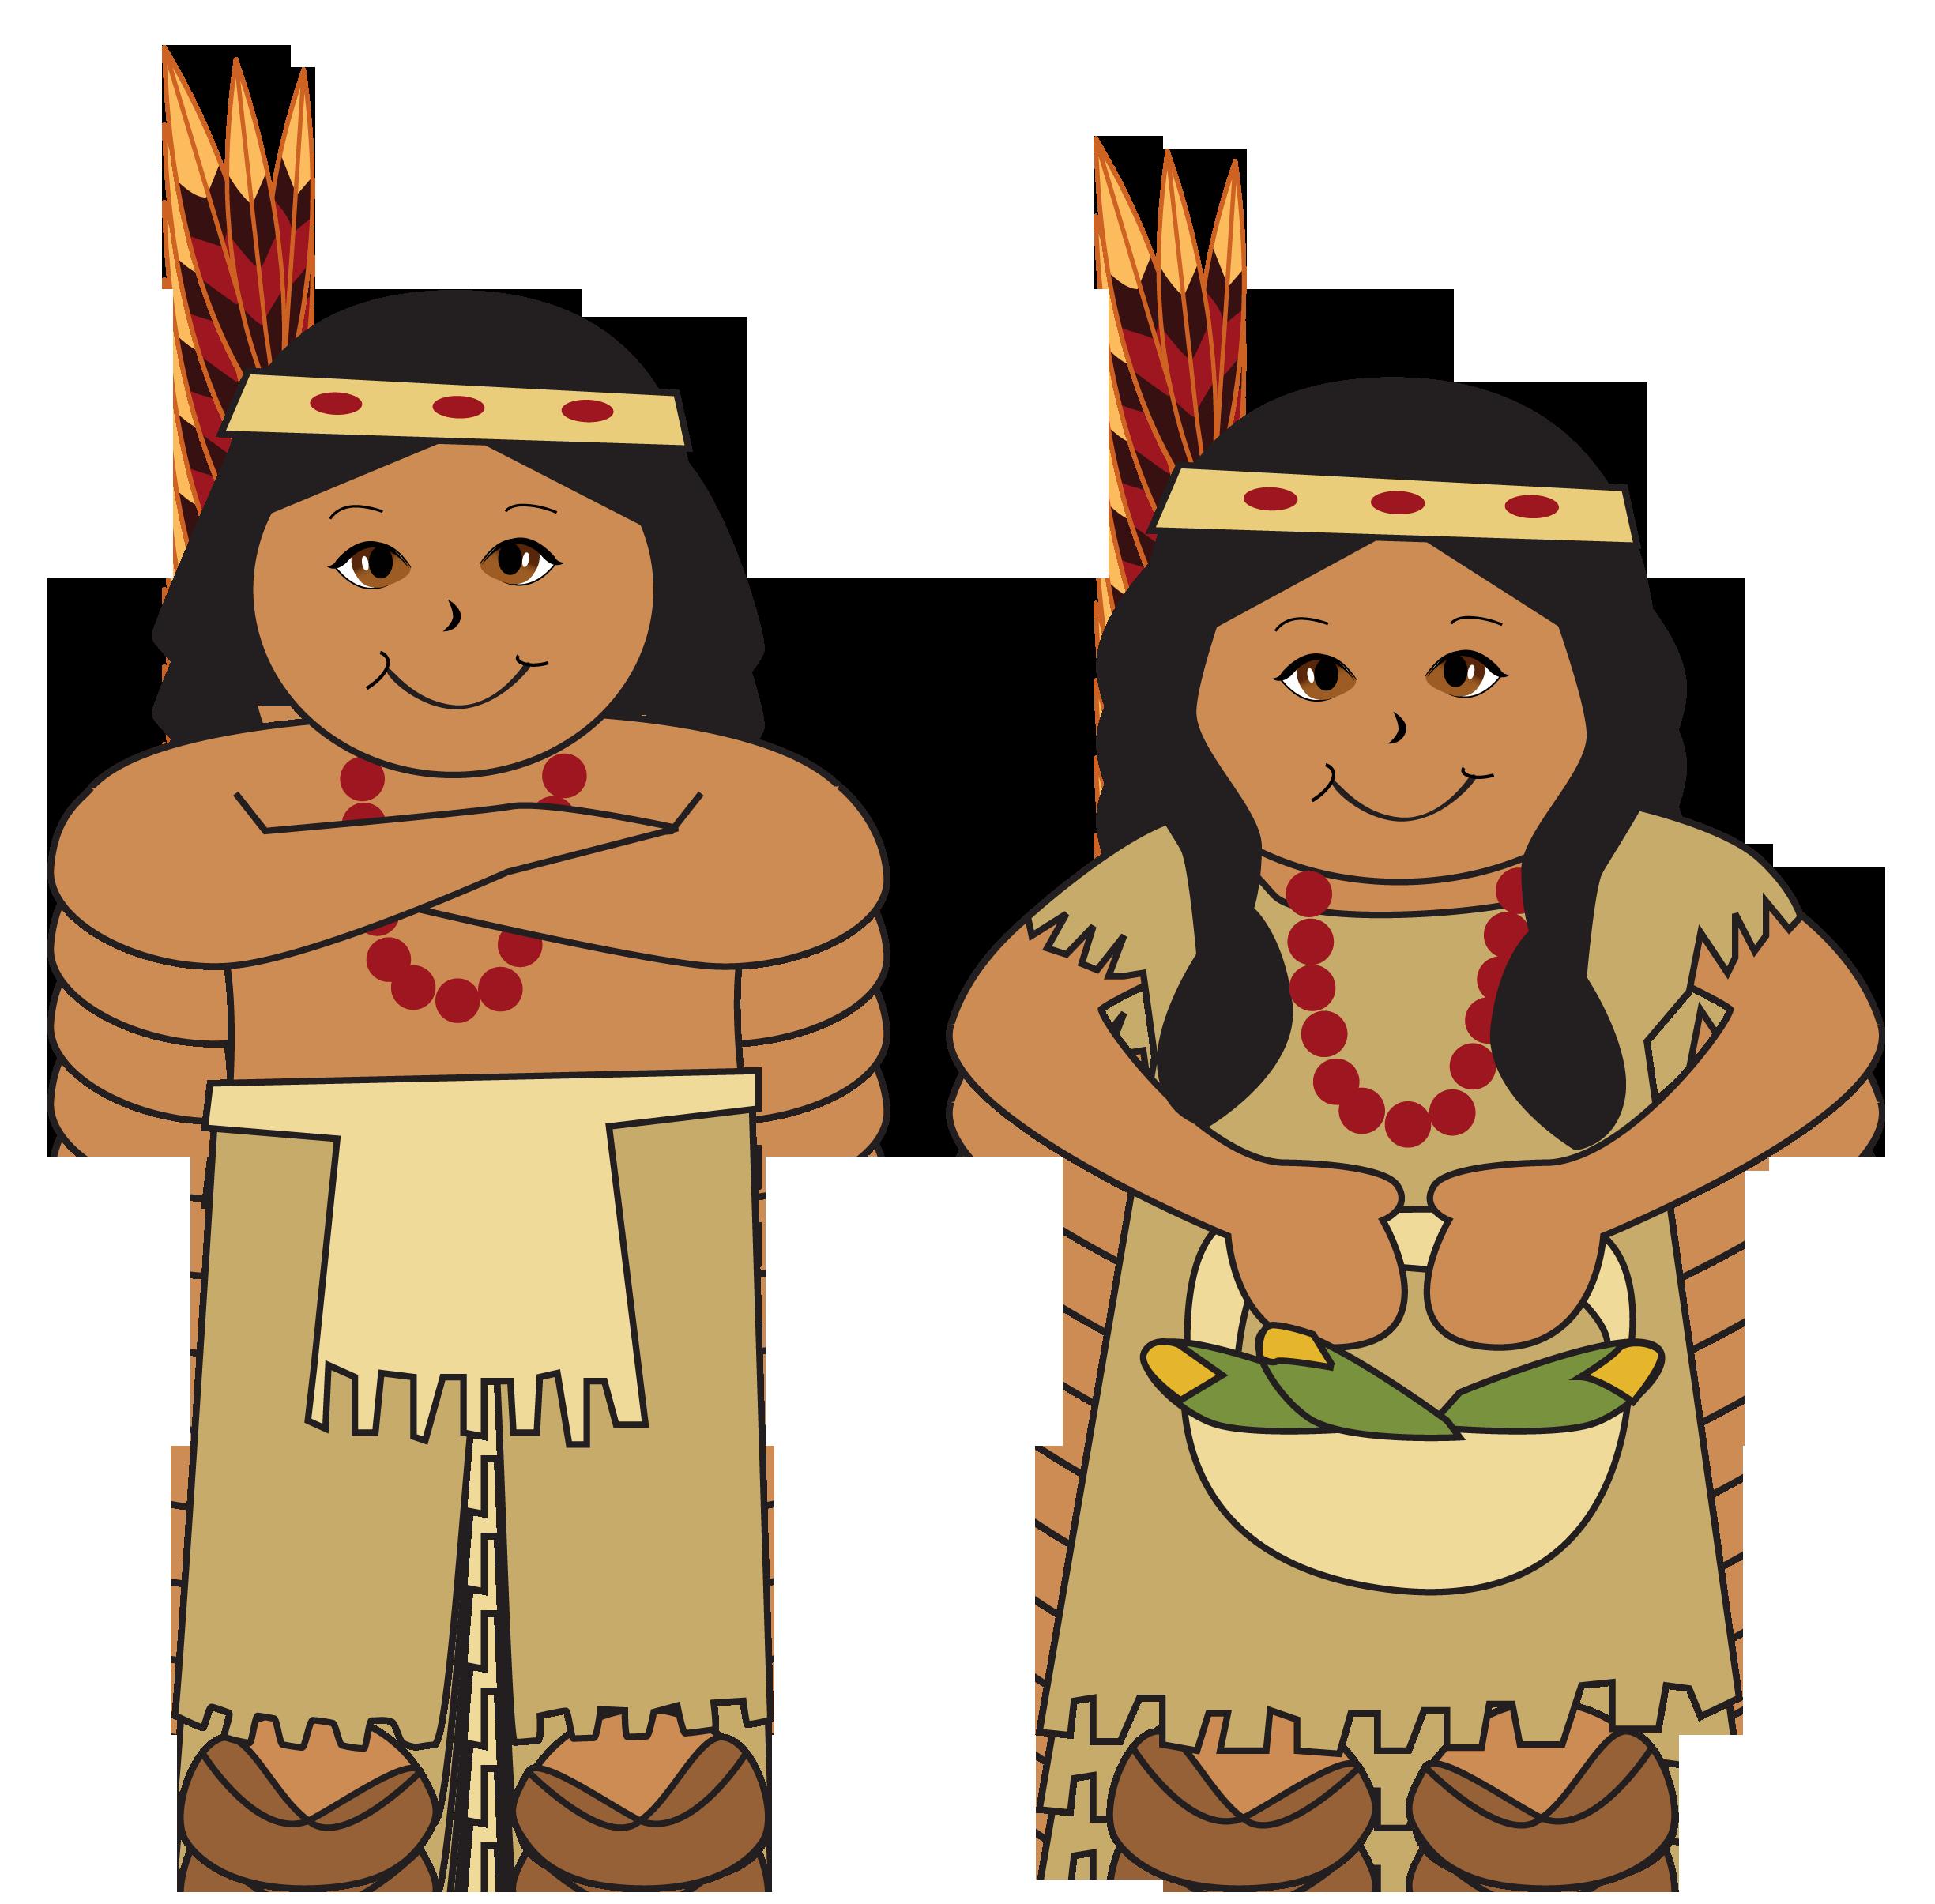 Native american indian native american indian a clip art.